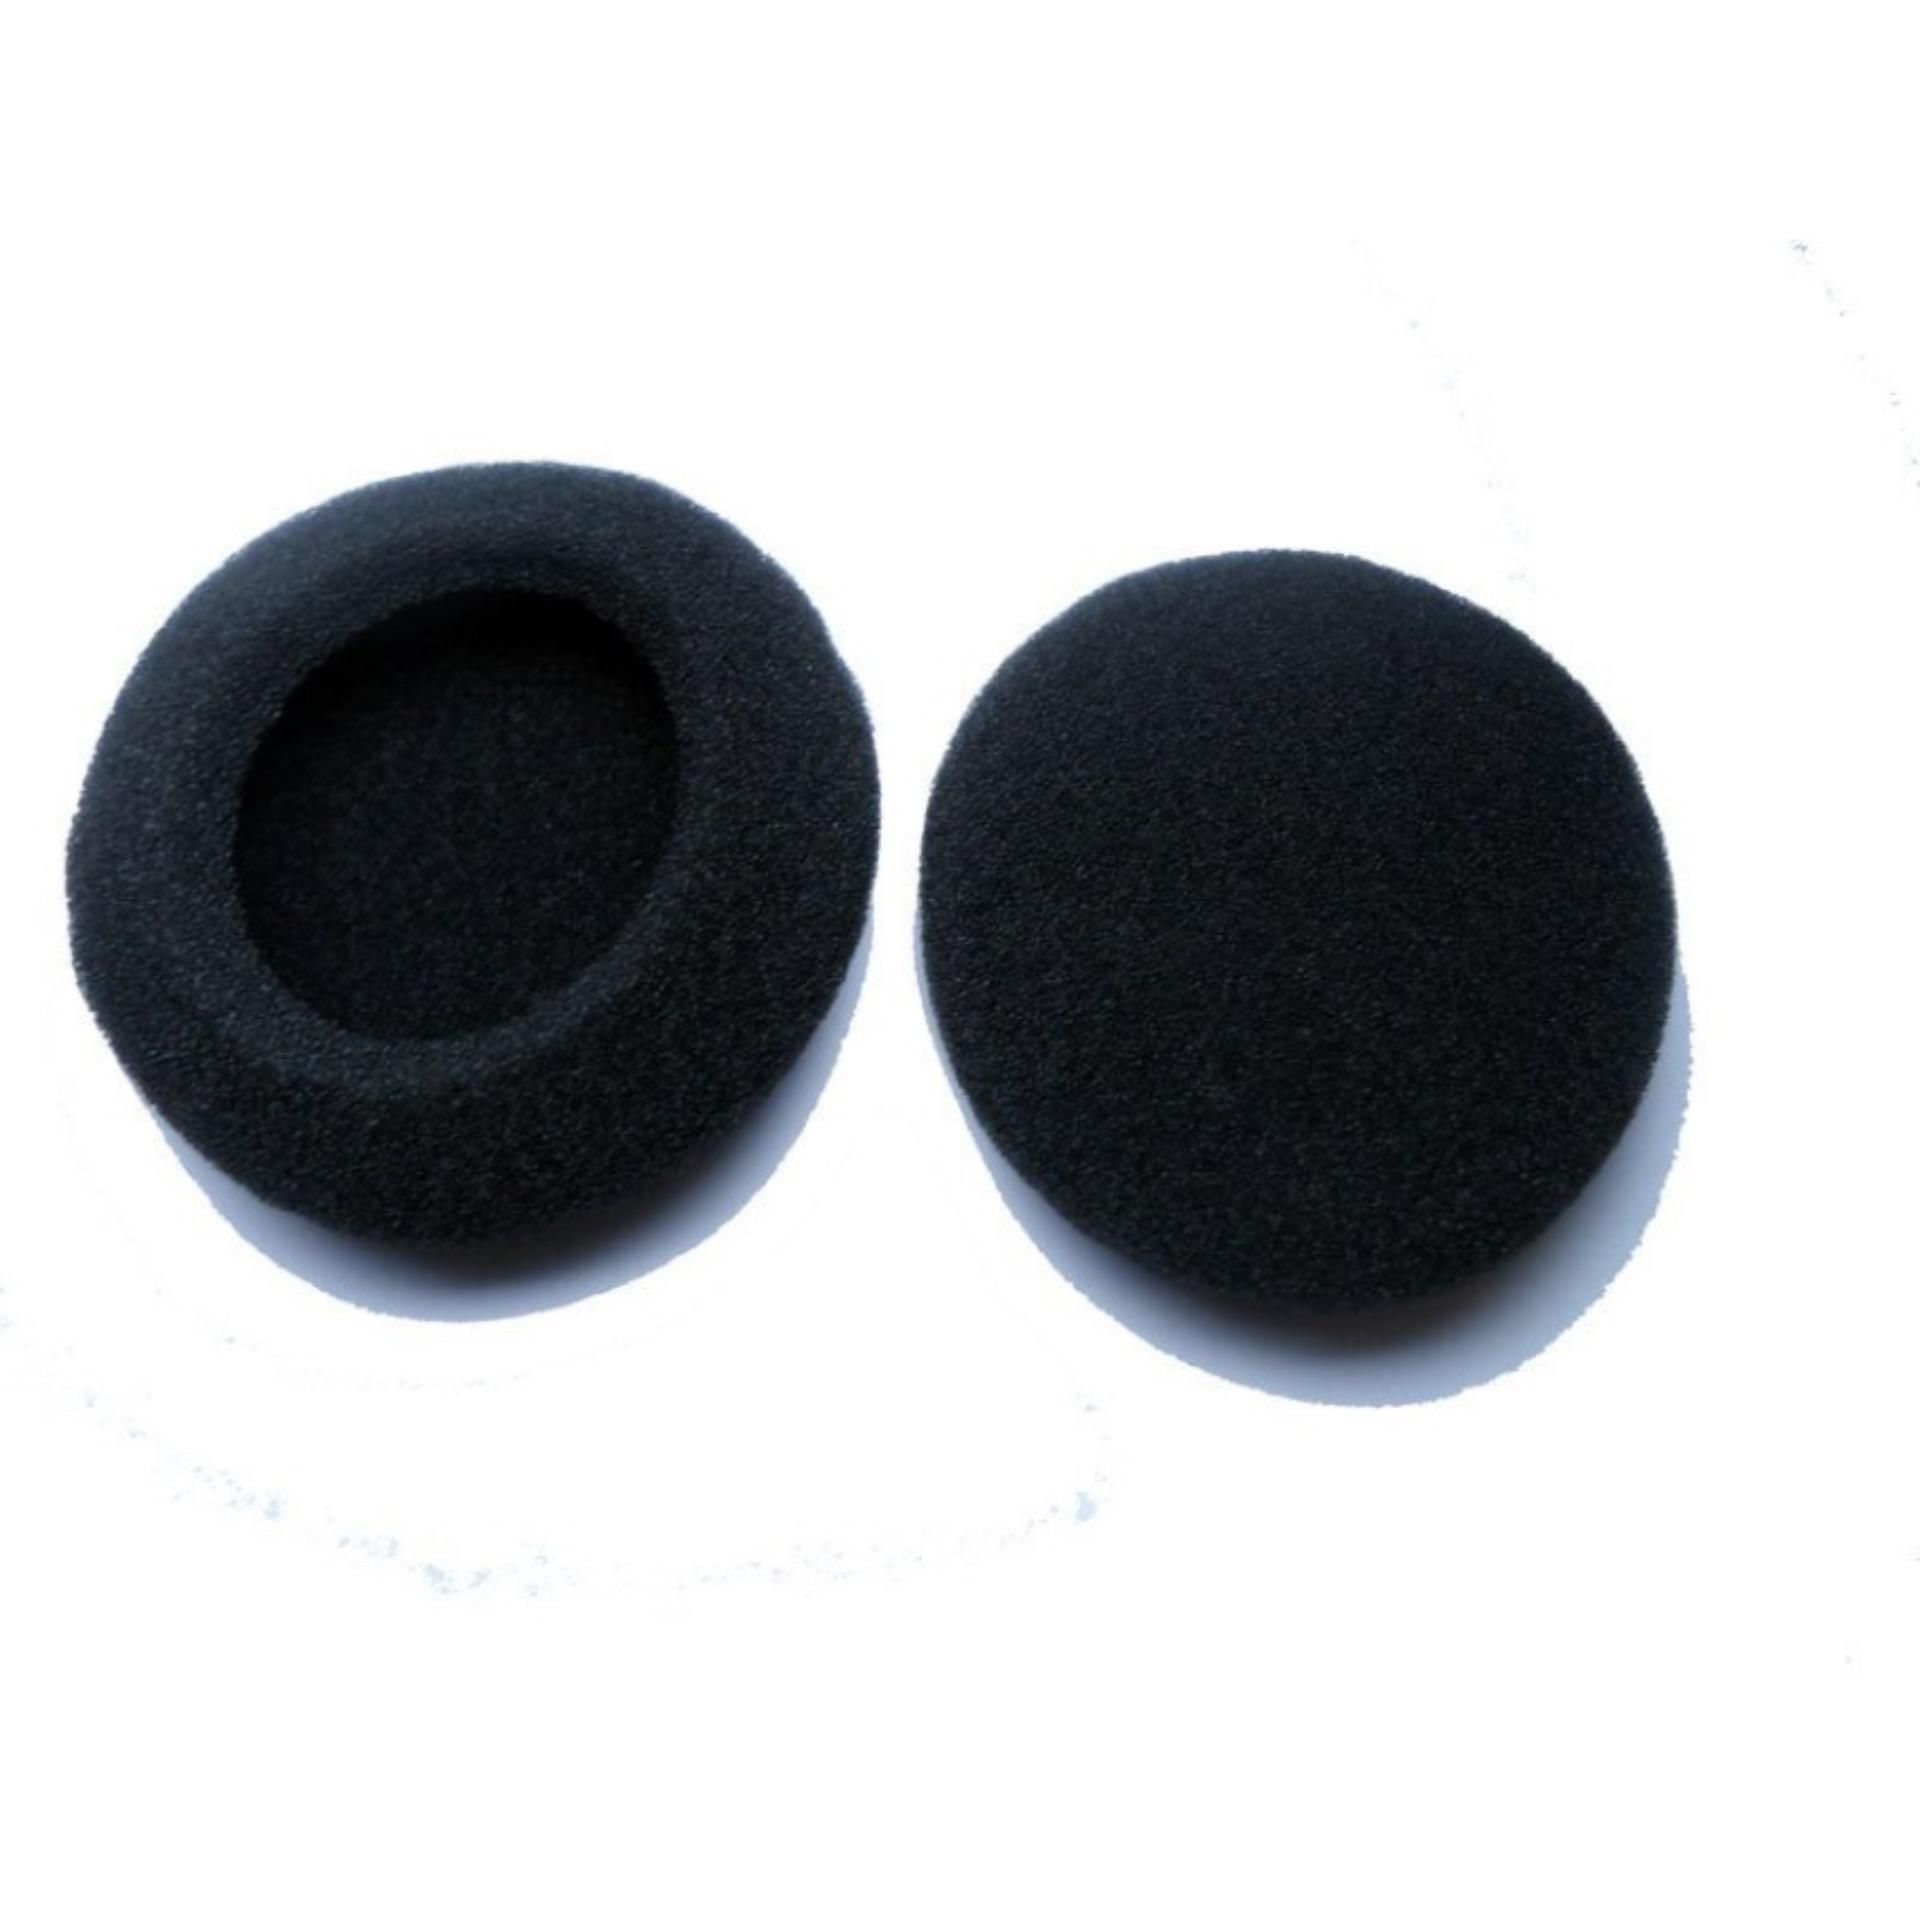 Busa Headphone / Headset Pengganti Universal Diameter 5.5cm - Hitam